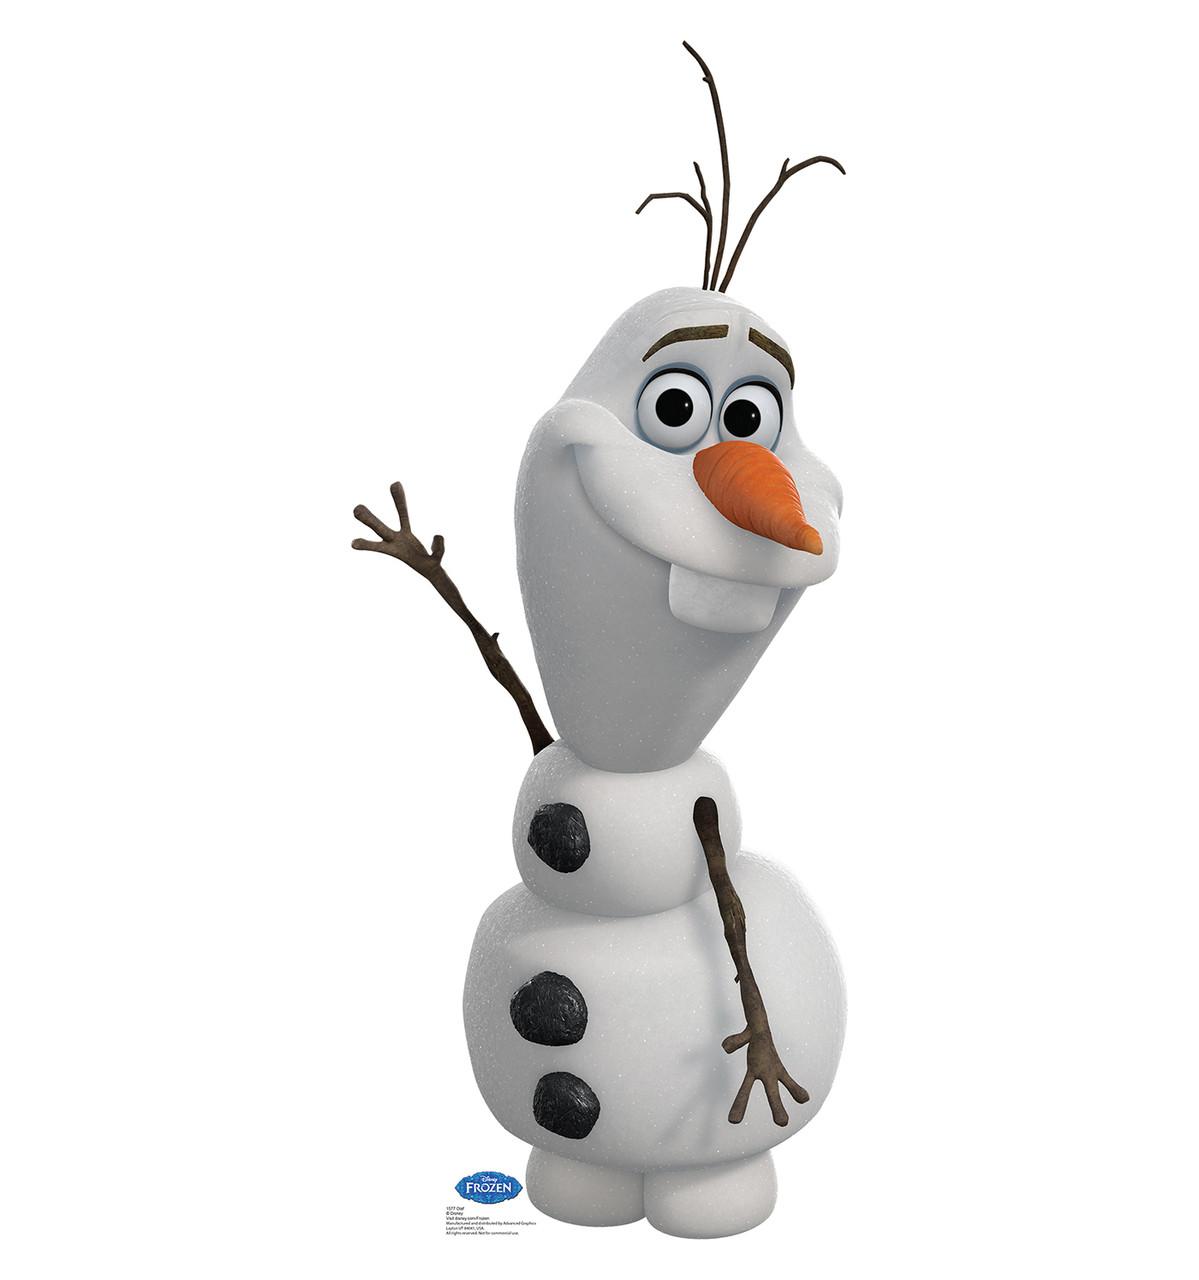 Life-size Olaf - Disney's Frozen Cardboard Standup